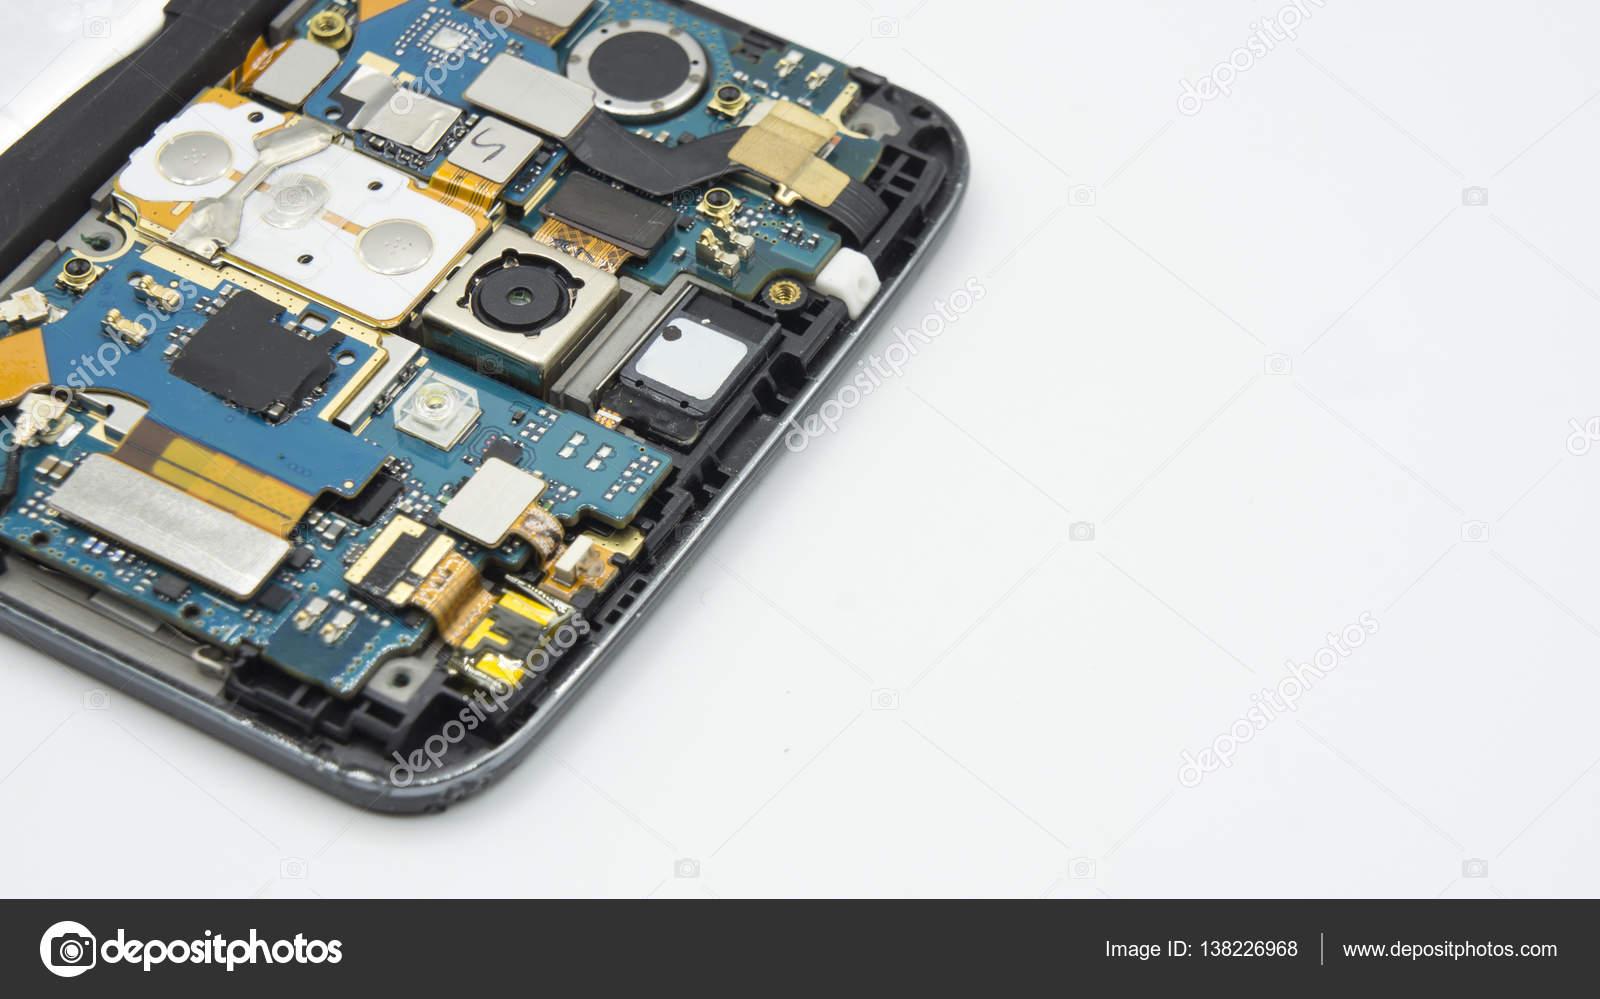 Circuito Aberto : Corrigir danos ic placa de circuito aberto de chave de fenda u2014 stock